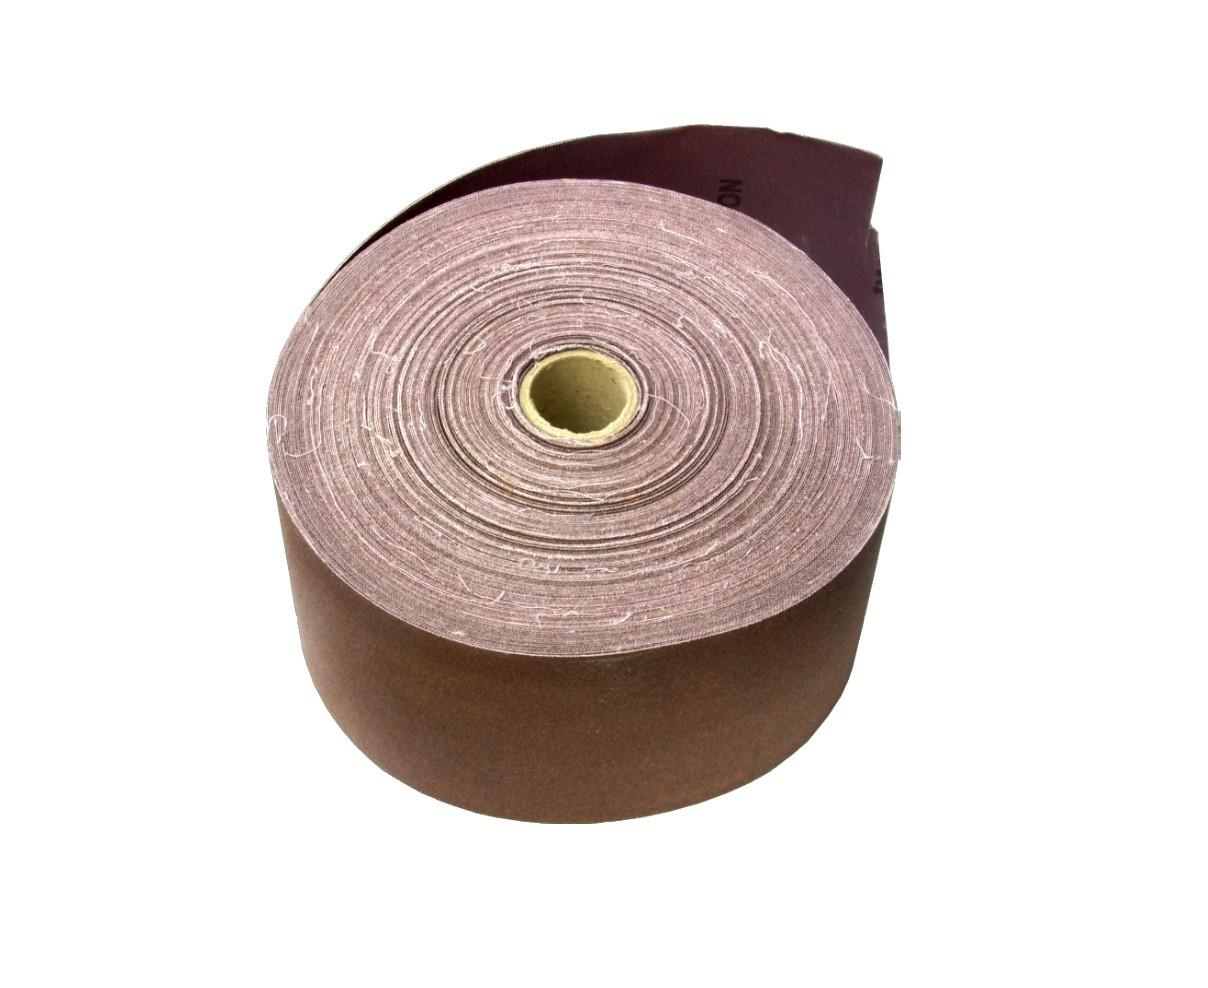 Smirghel Universal pe Suport Textil ETS Lungime 50m, Latime 100mm, Granulatie 60 imagine techstar.ro 2021